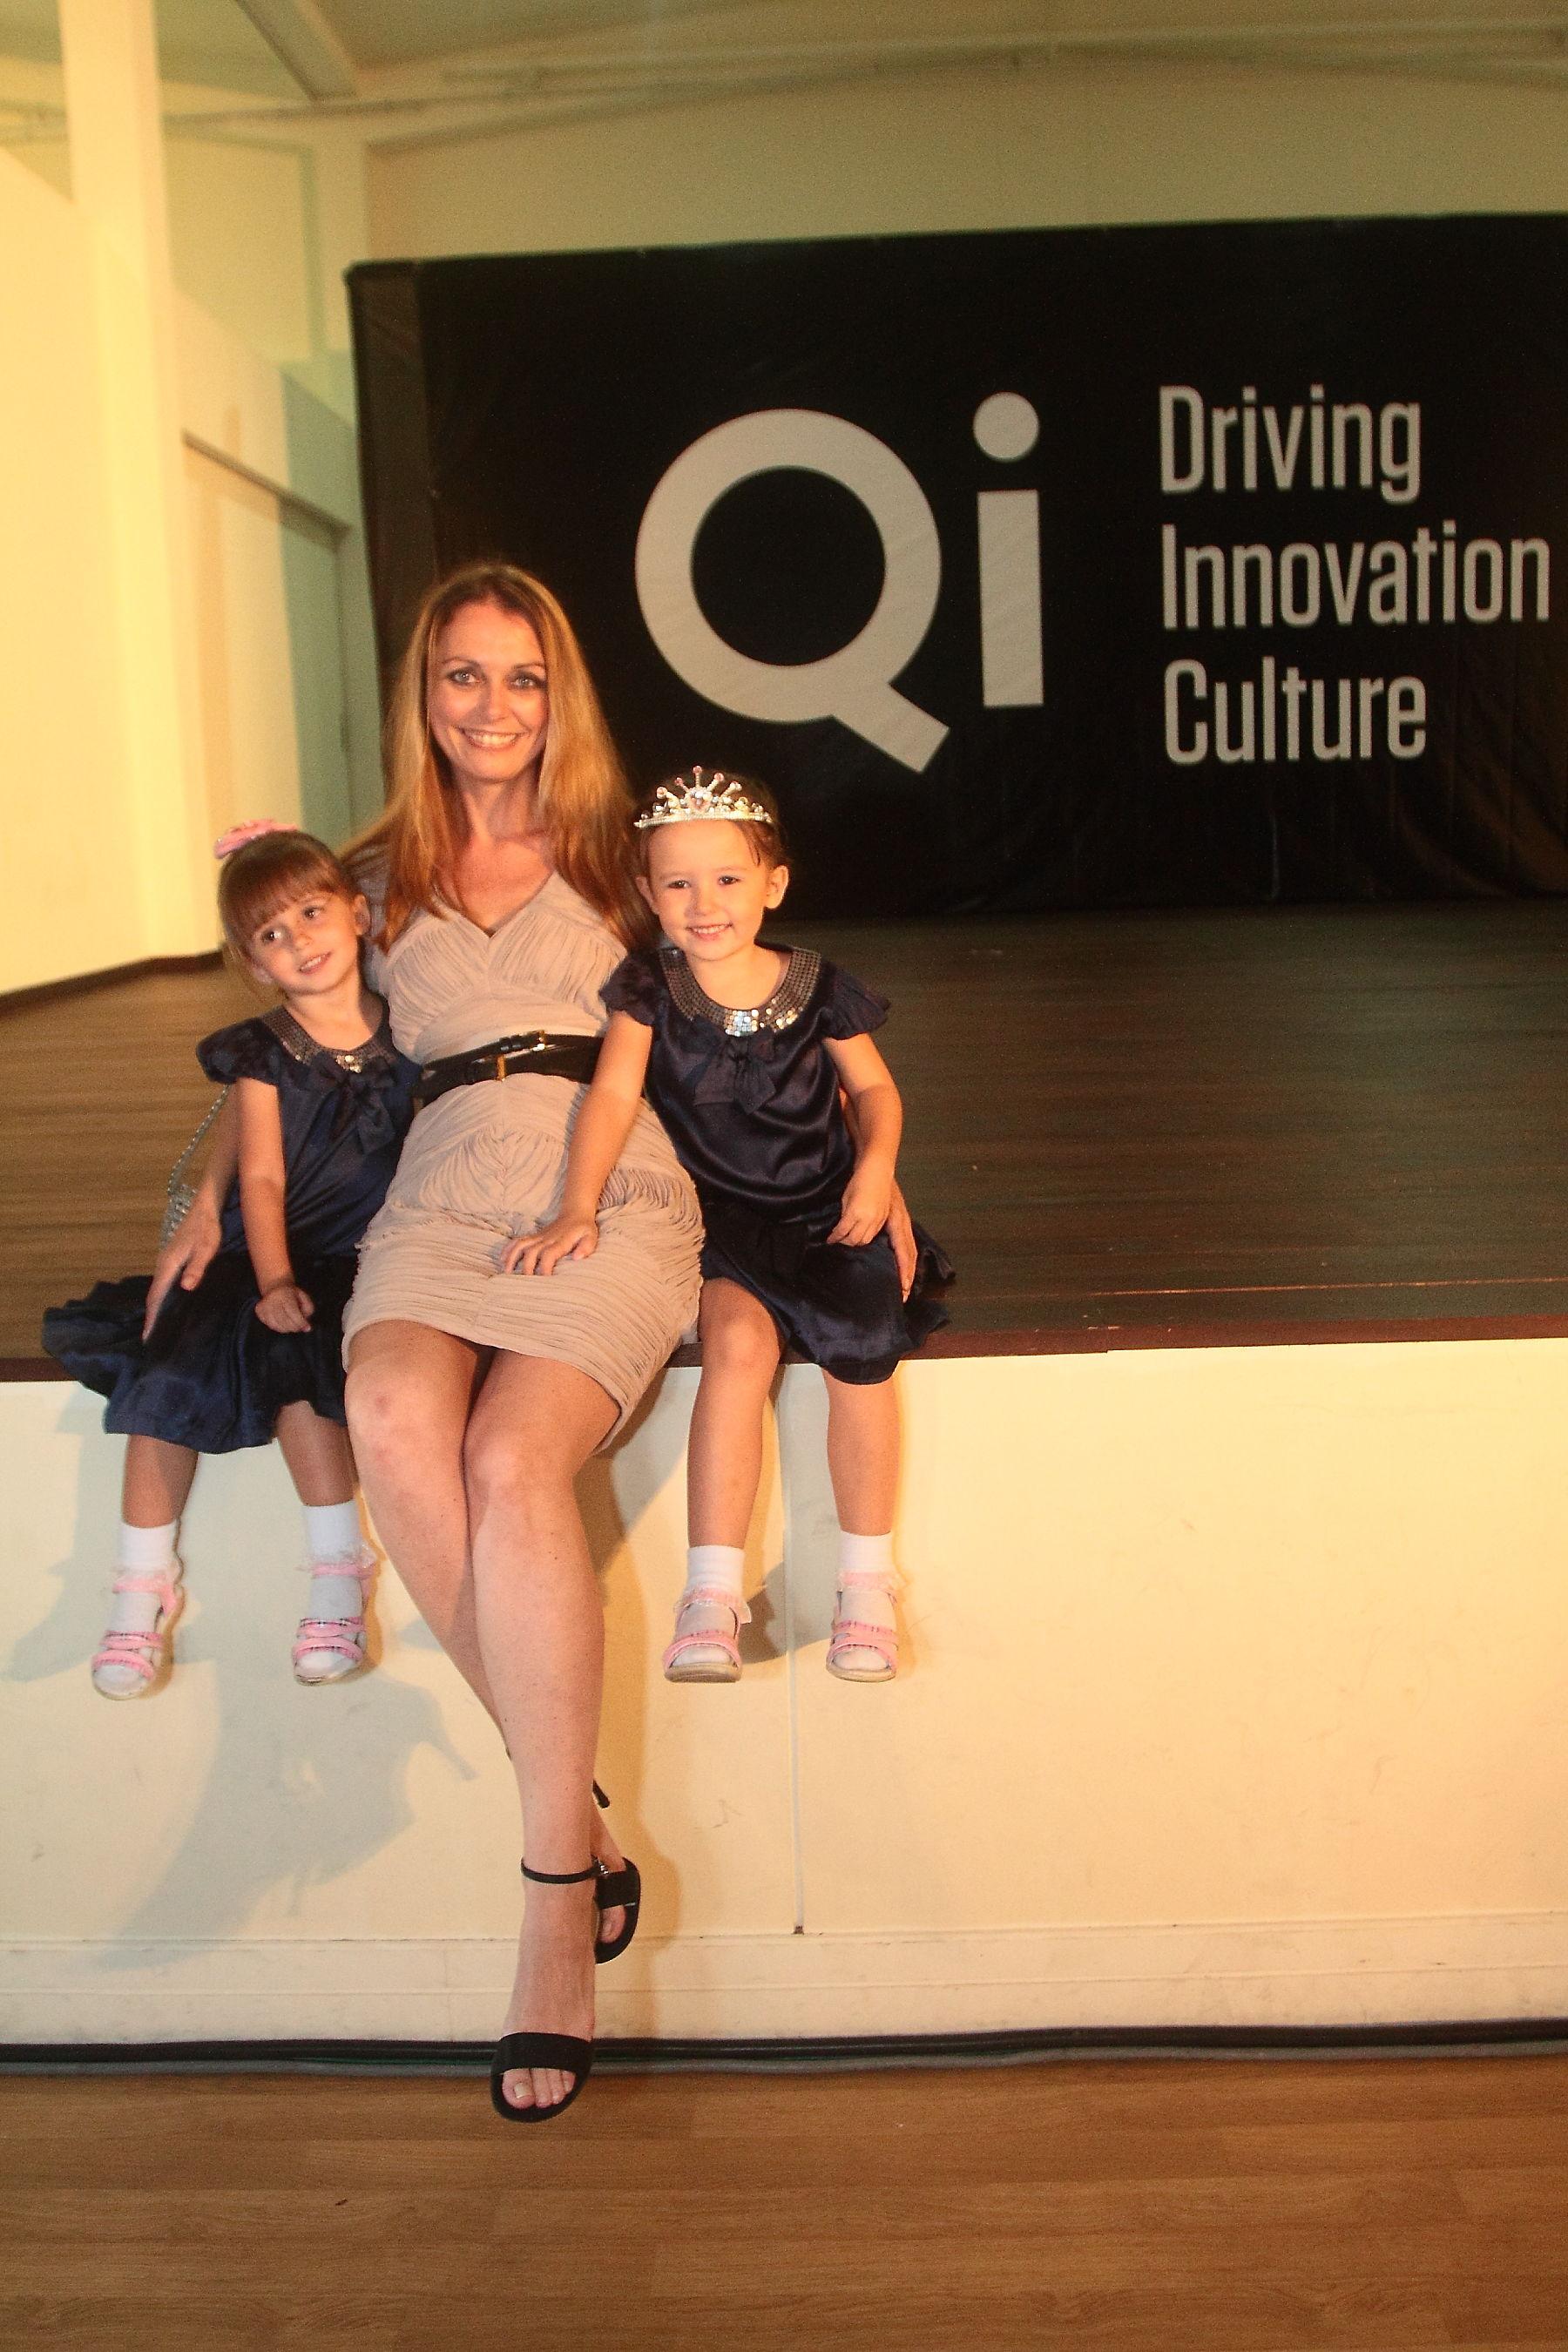 qi-global-2011-driving-innovation-culture-010-mamakan.jpg